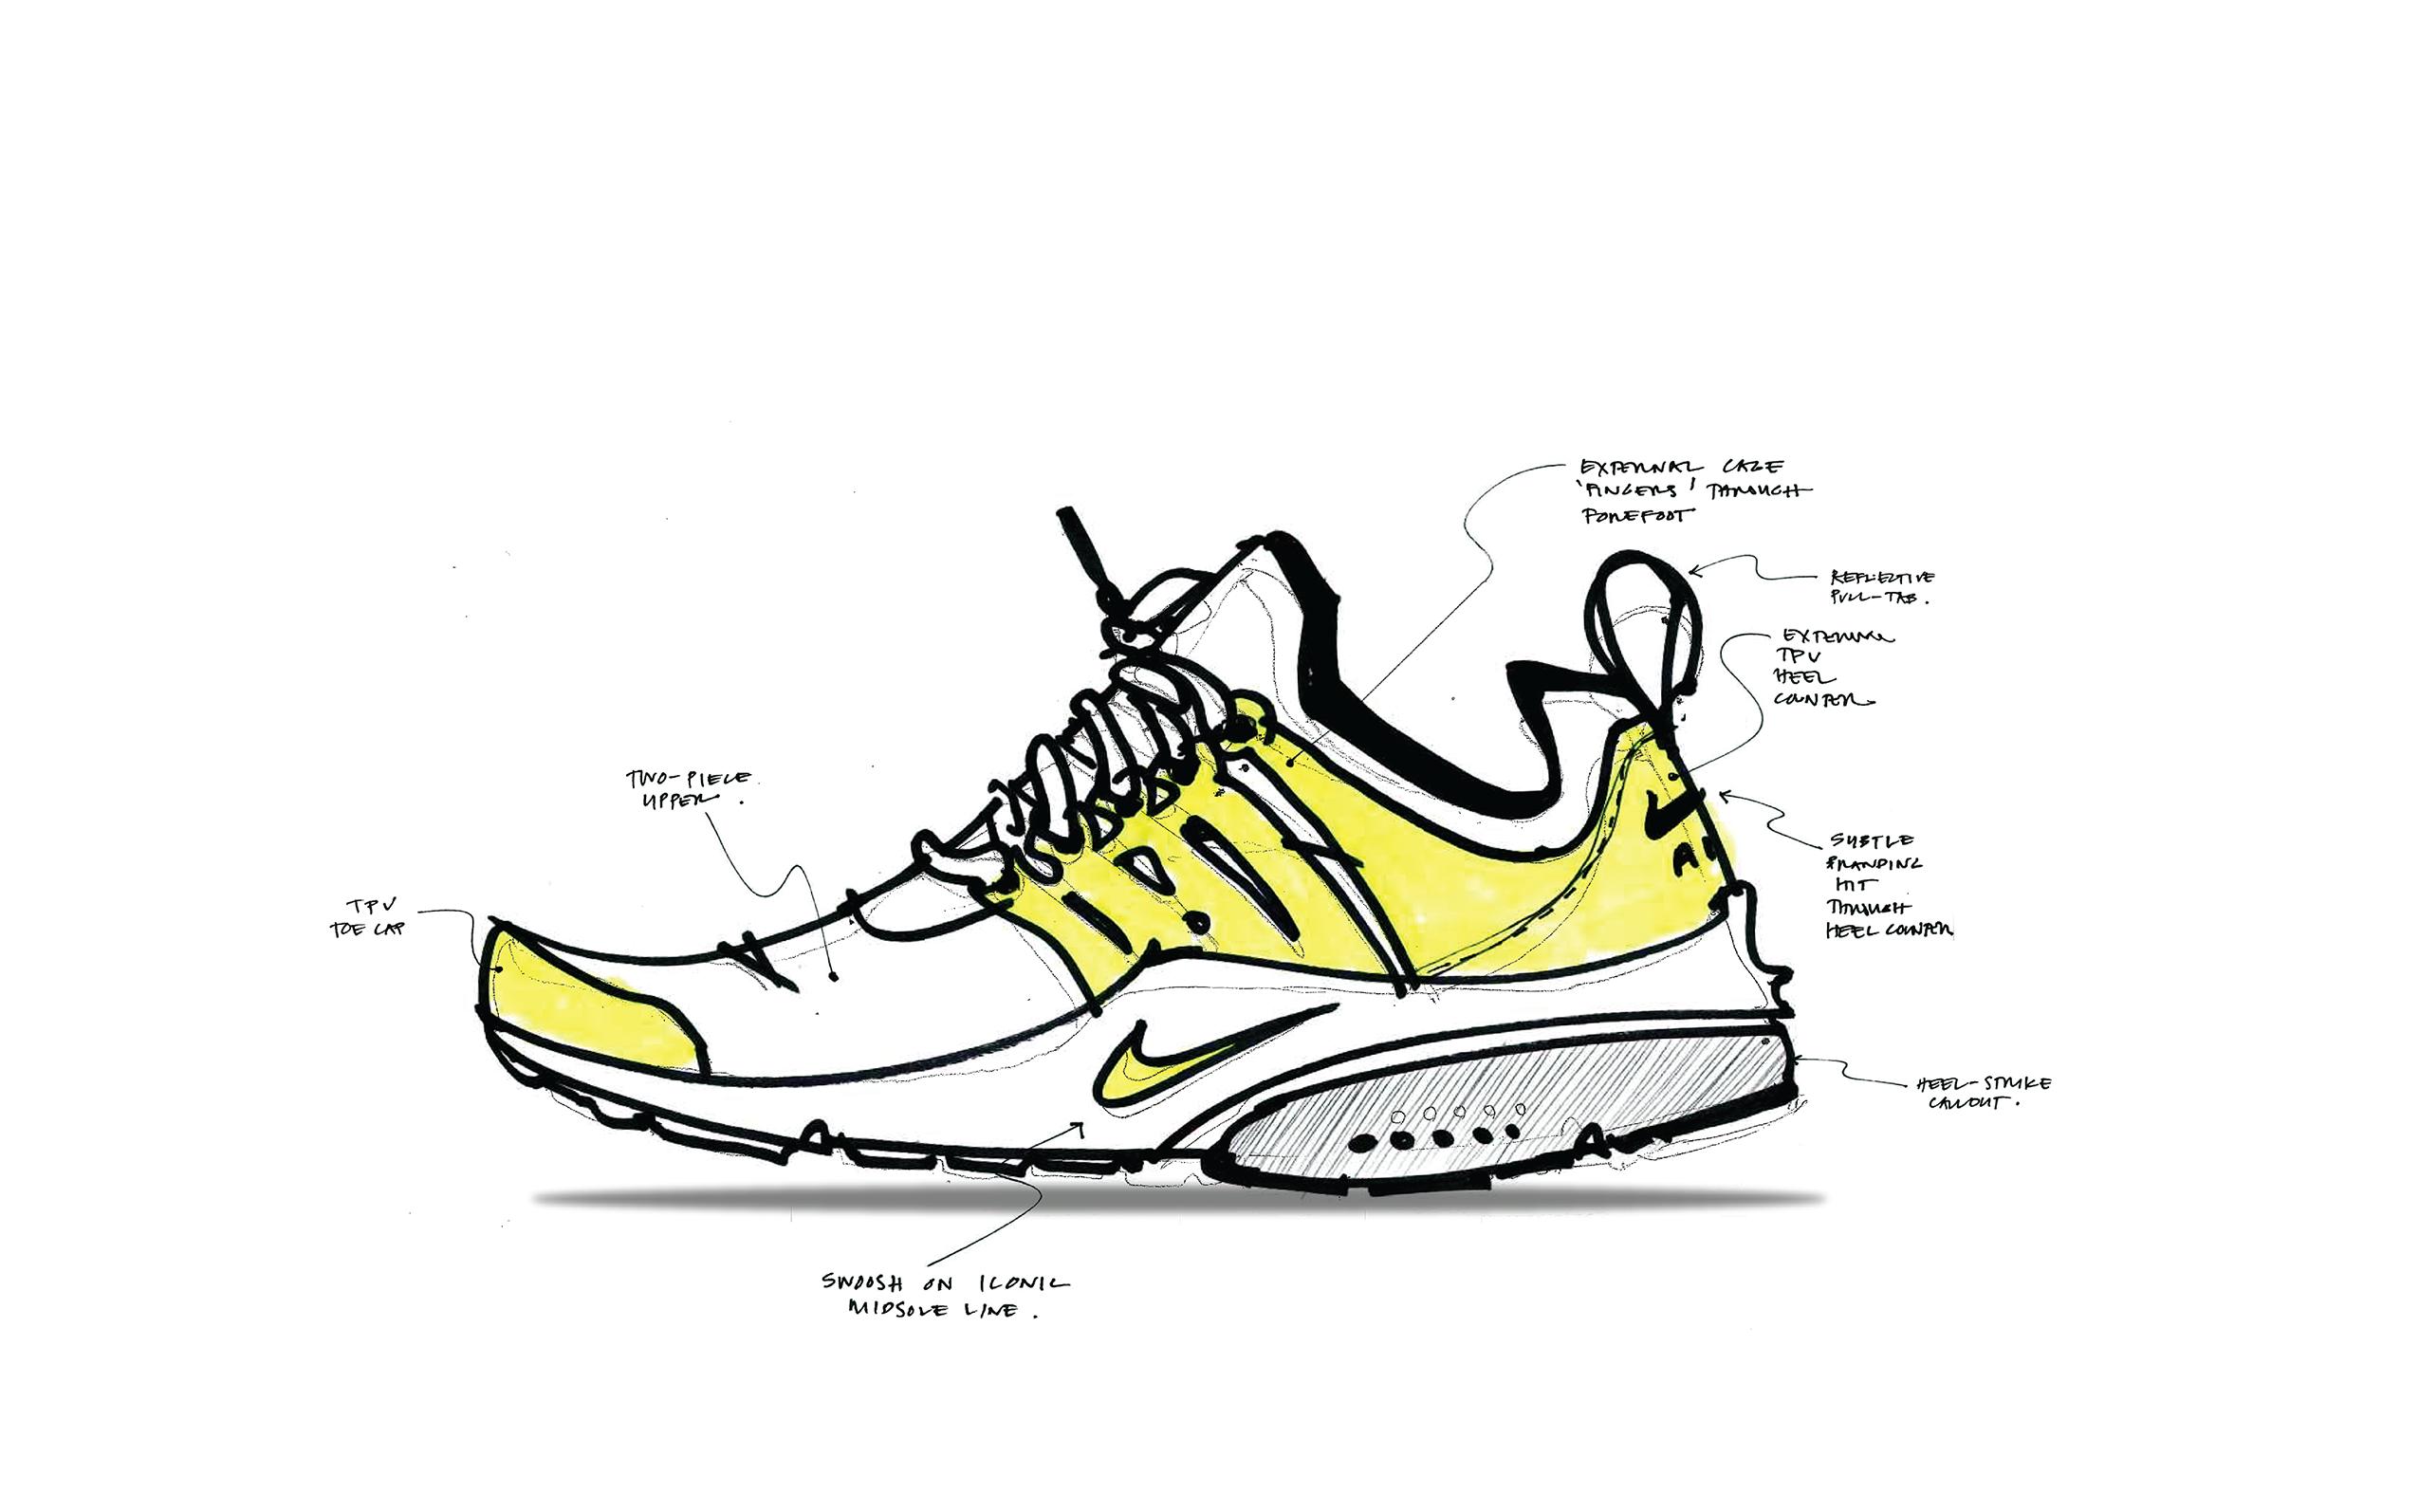 Nike_Air_Presto_Flyknit_sketch_55450